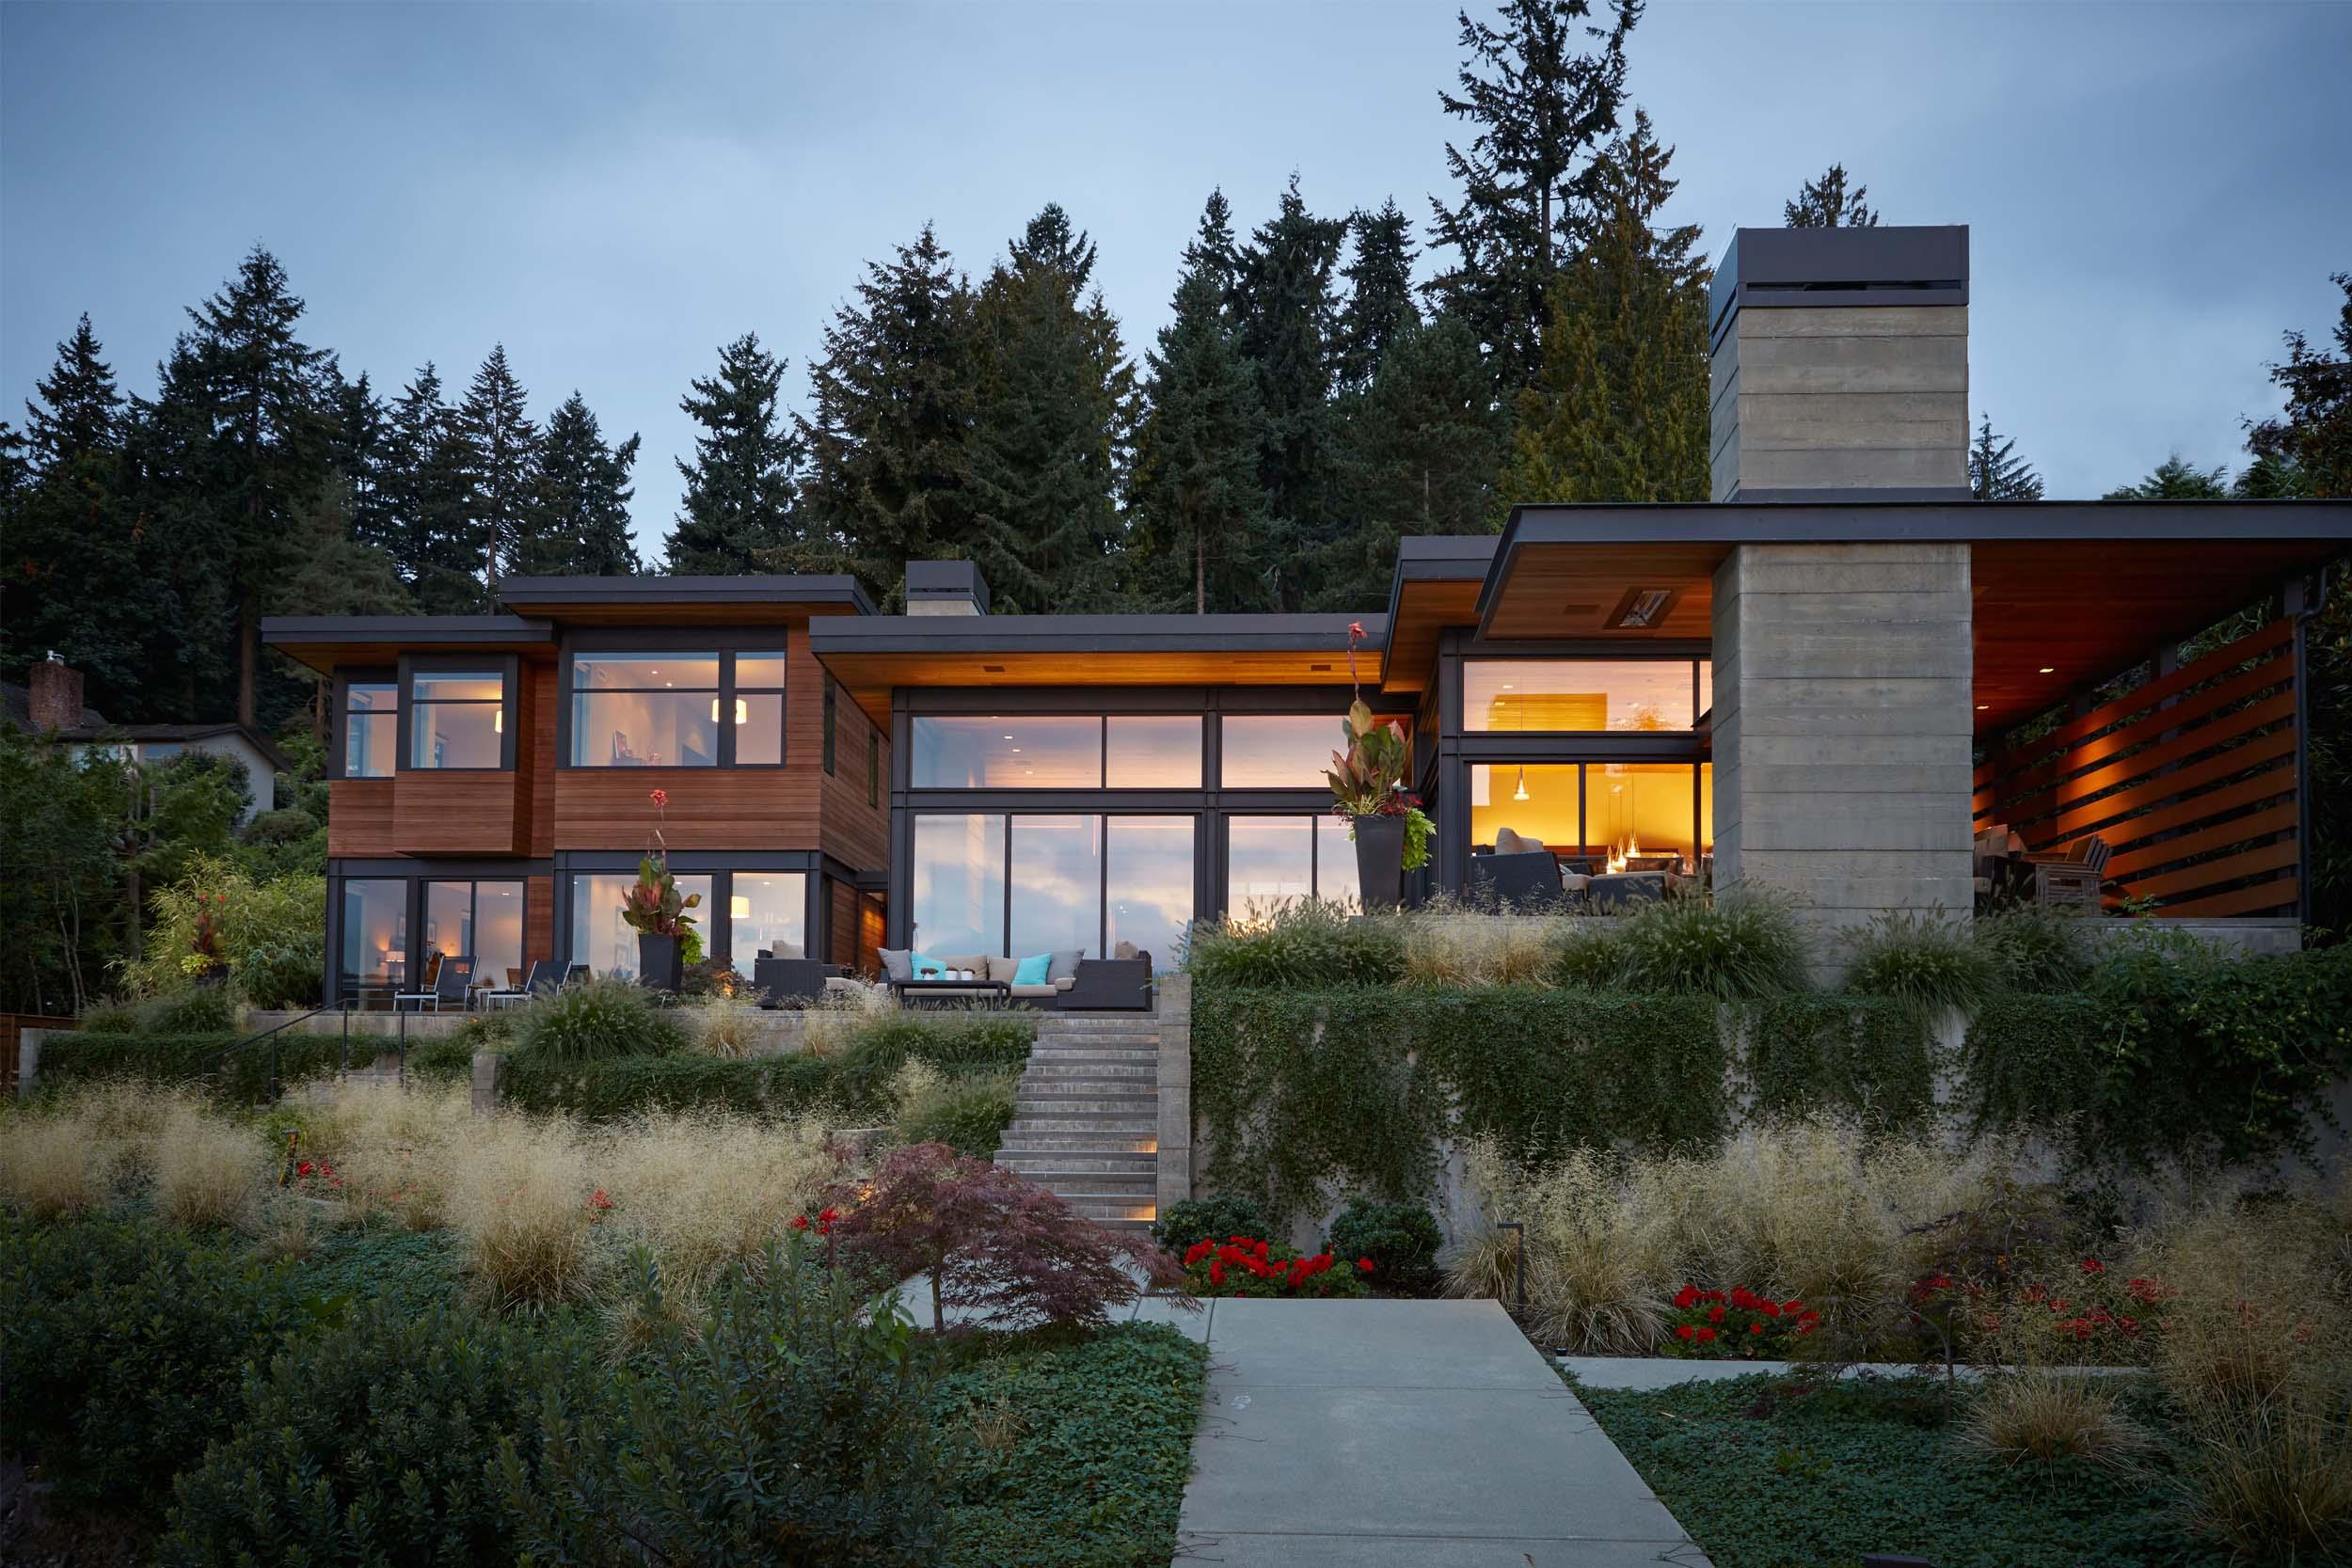 lakeshore-residence-5.jpg